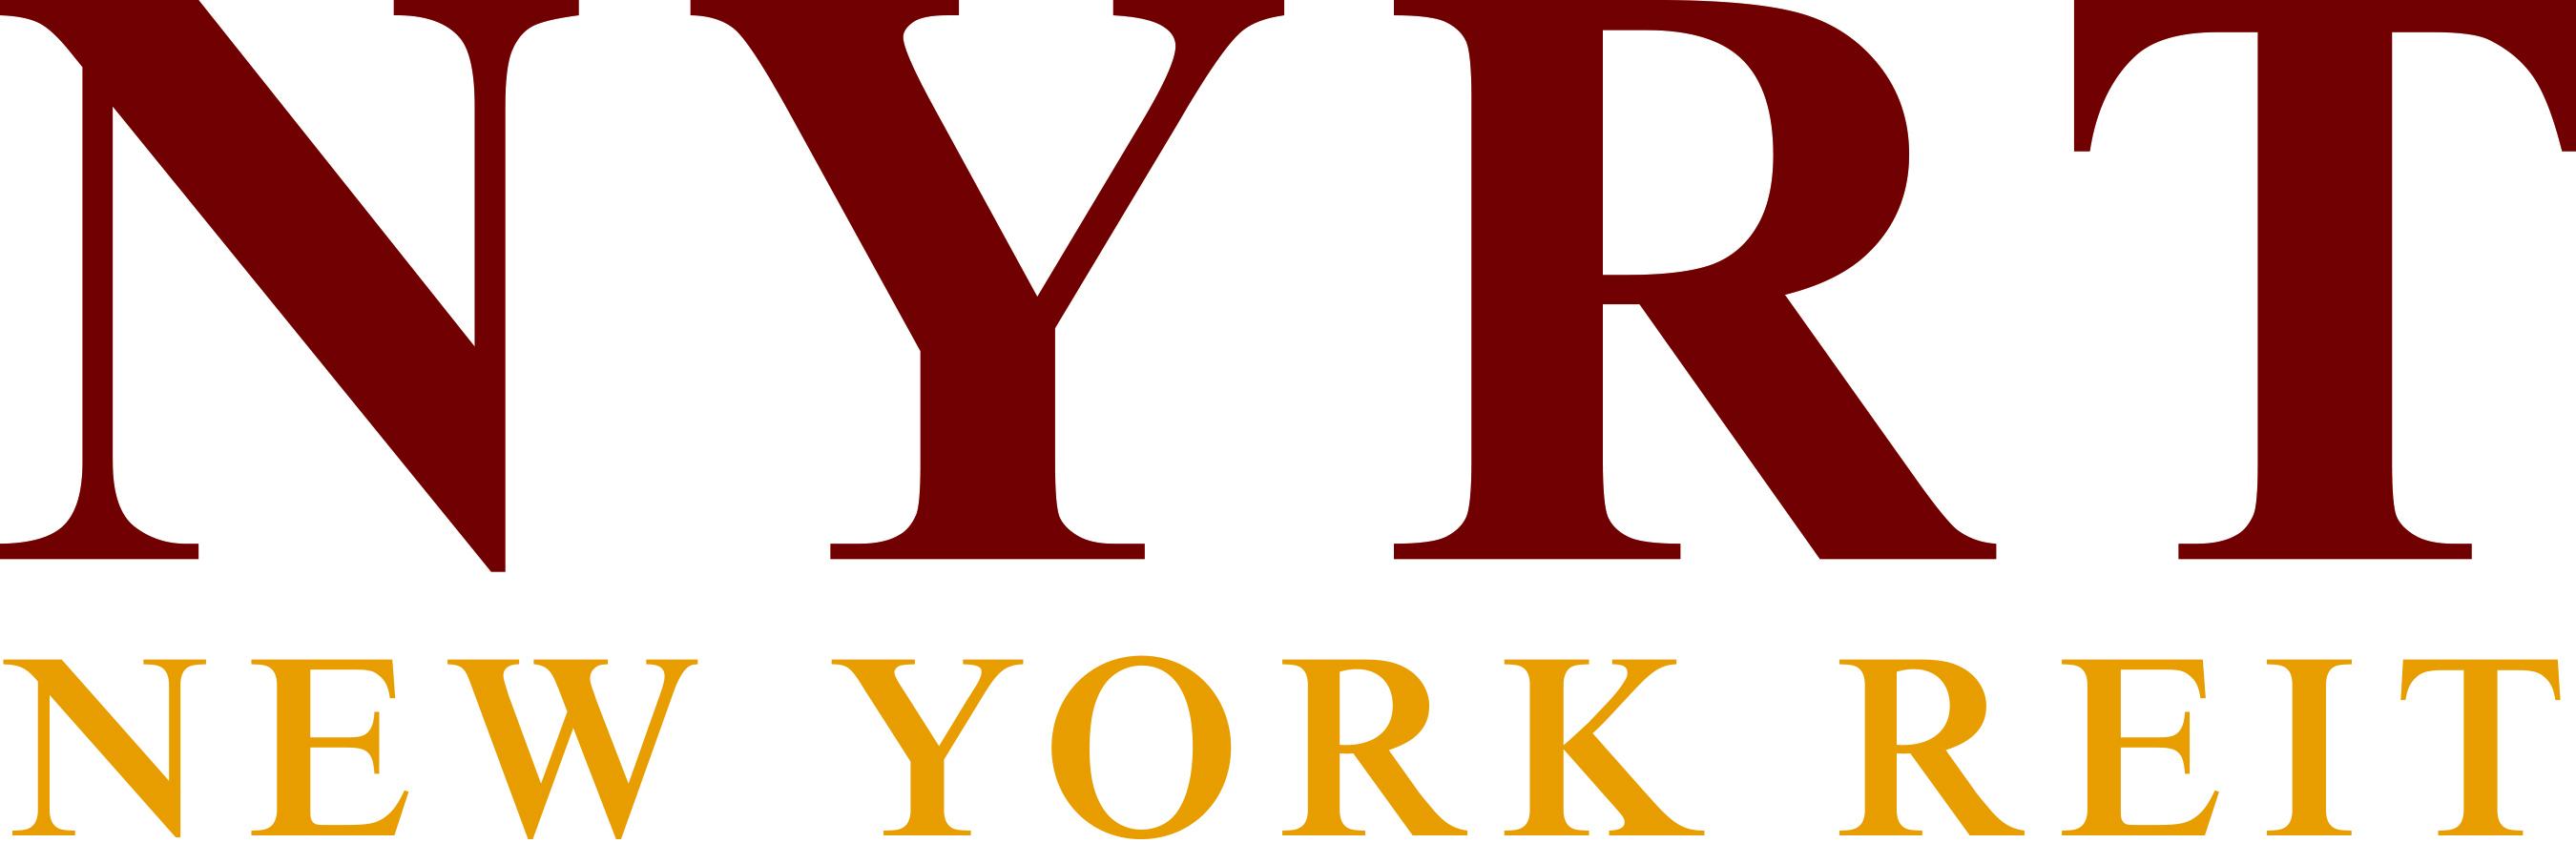 New York REIT, Inc.